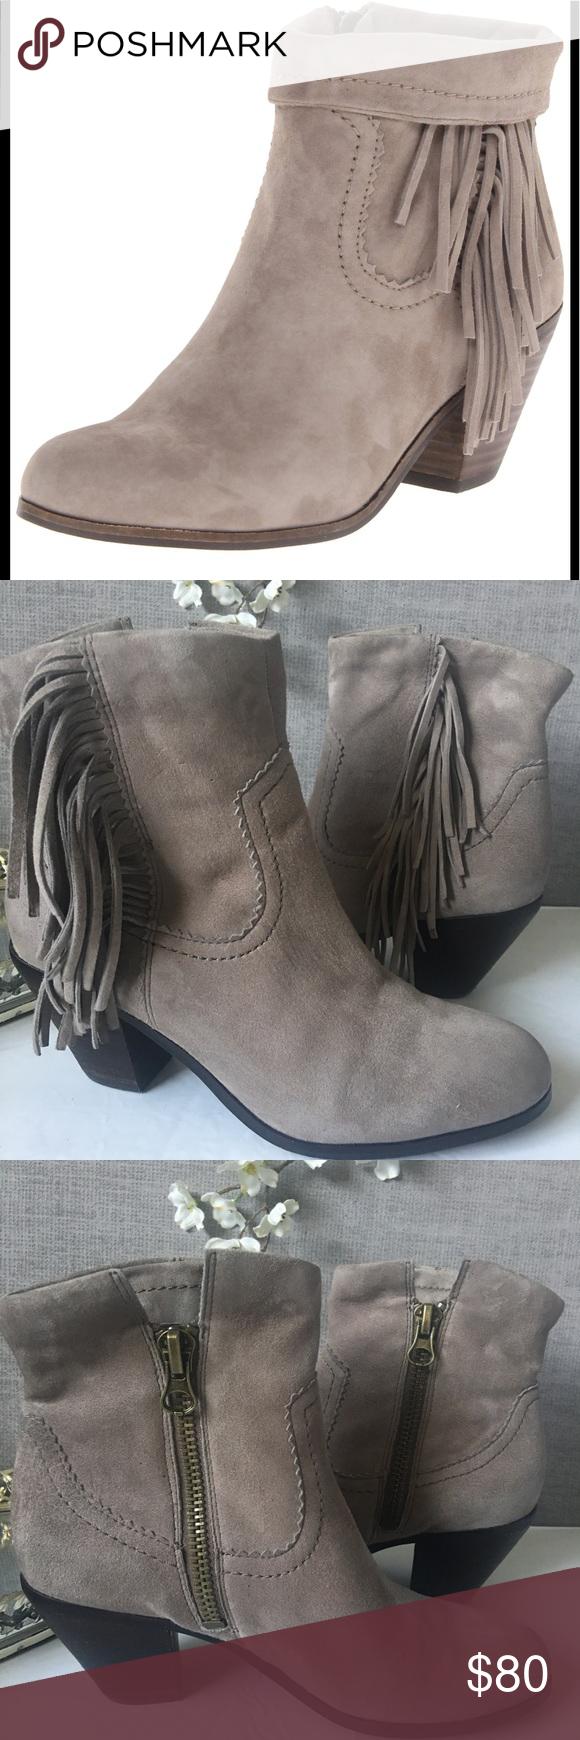 8e1647f03396 Sam Edelman Women s Louie Ankle Boot Brand New